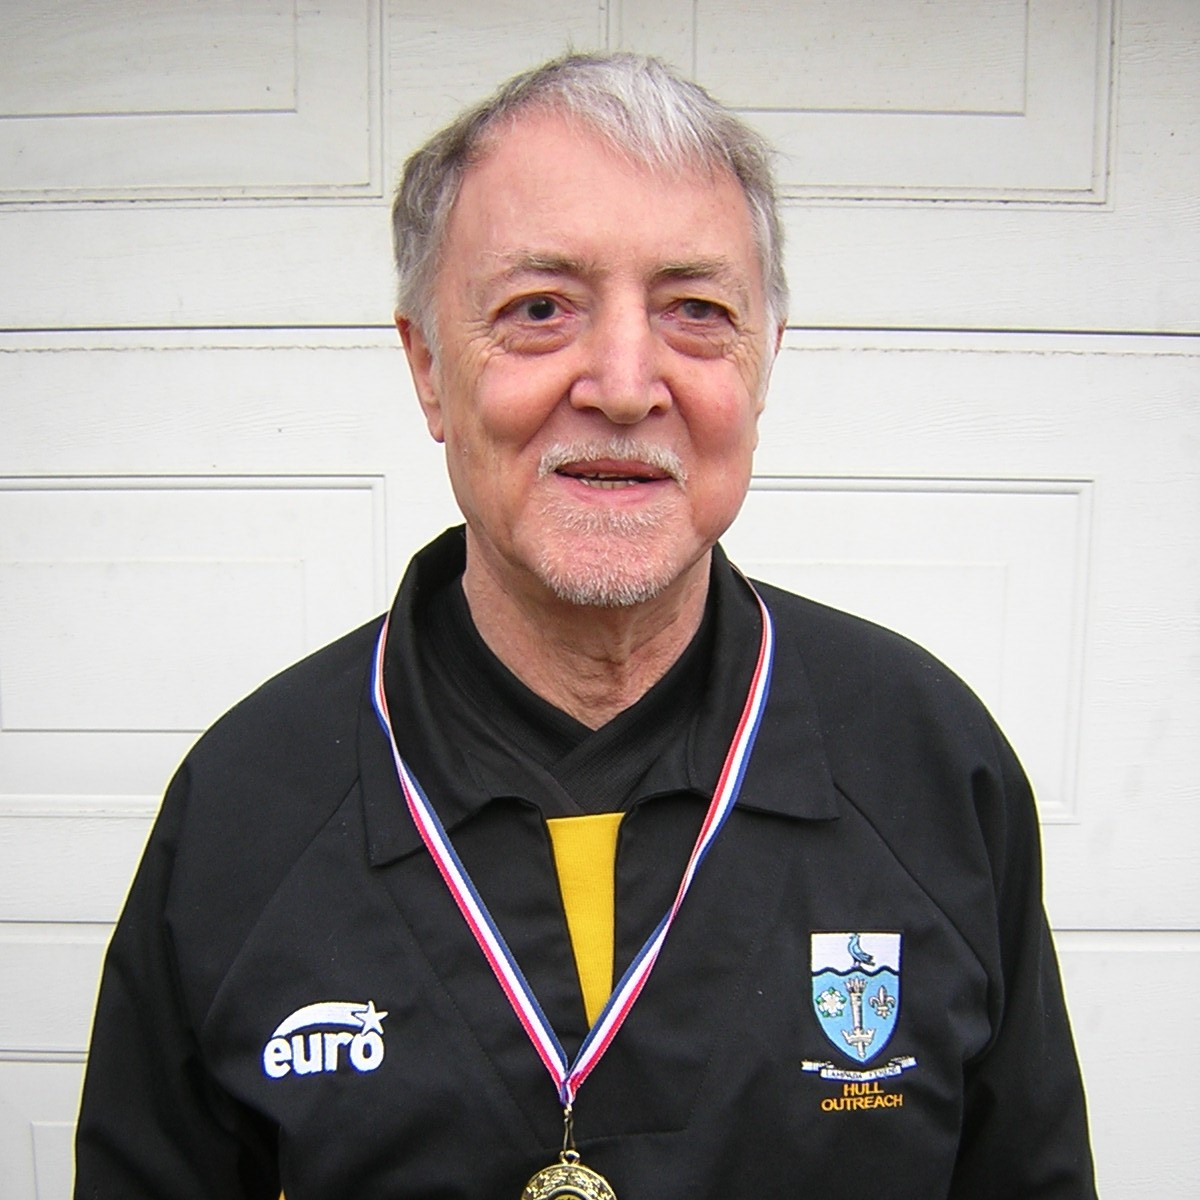 Colin Baxter